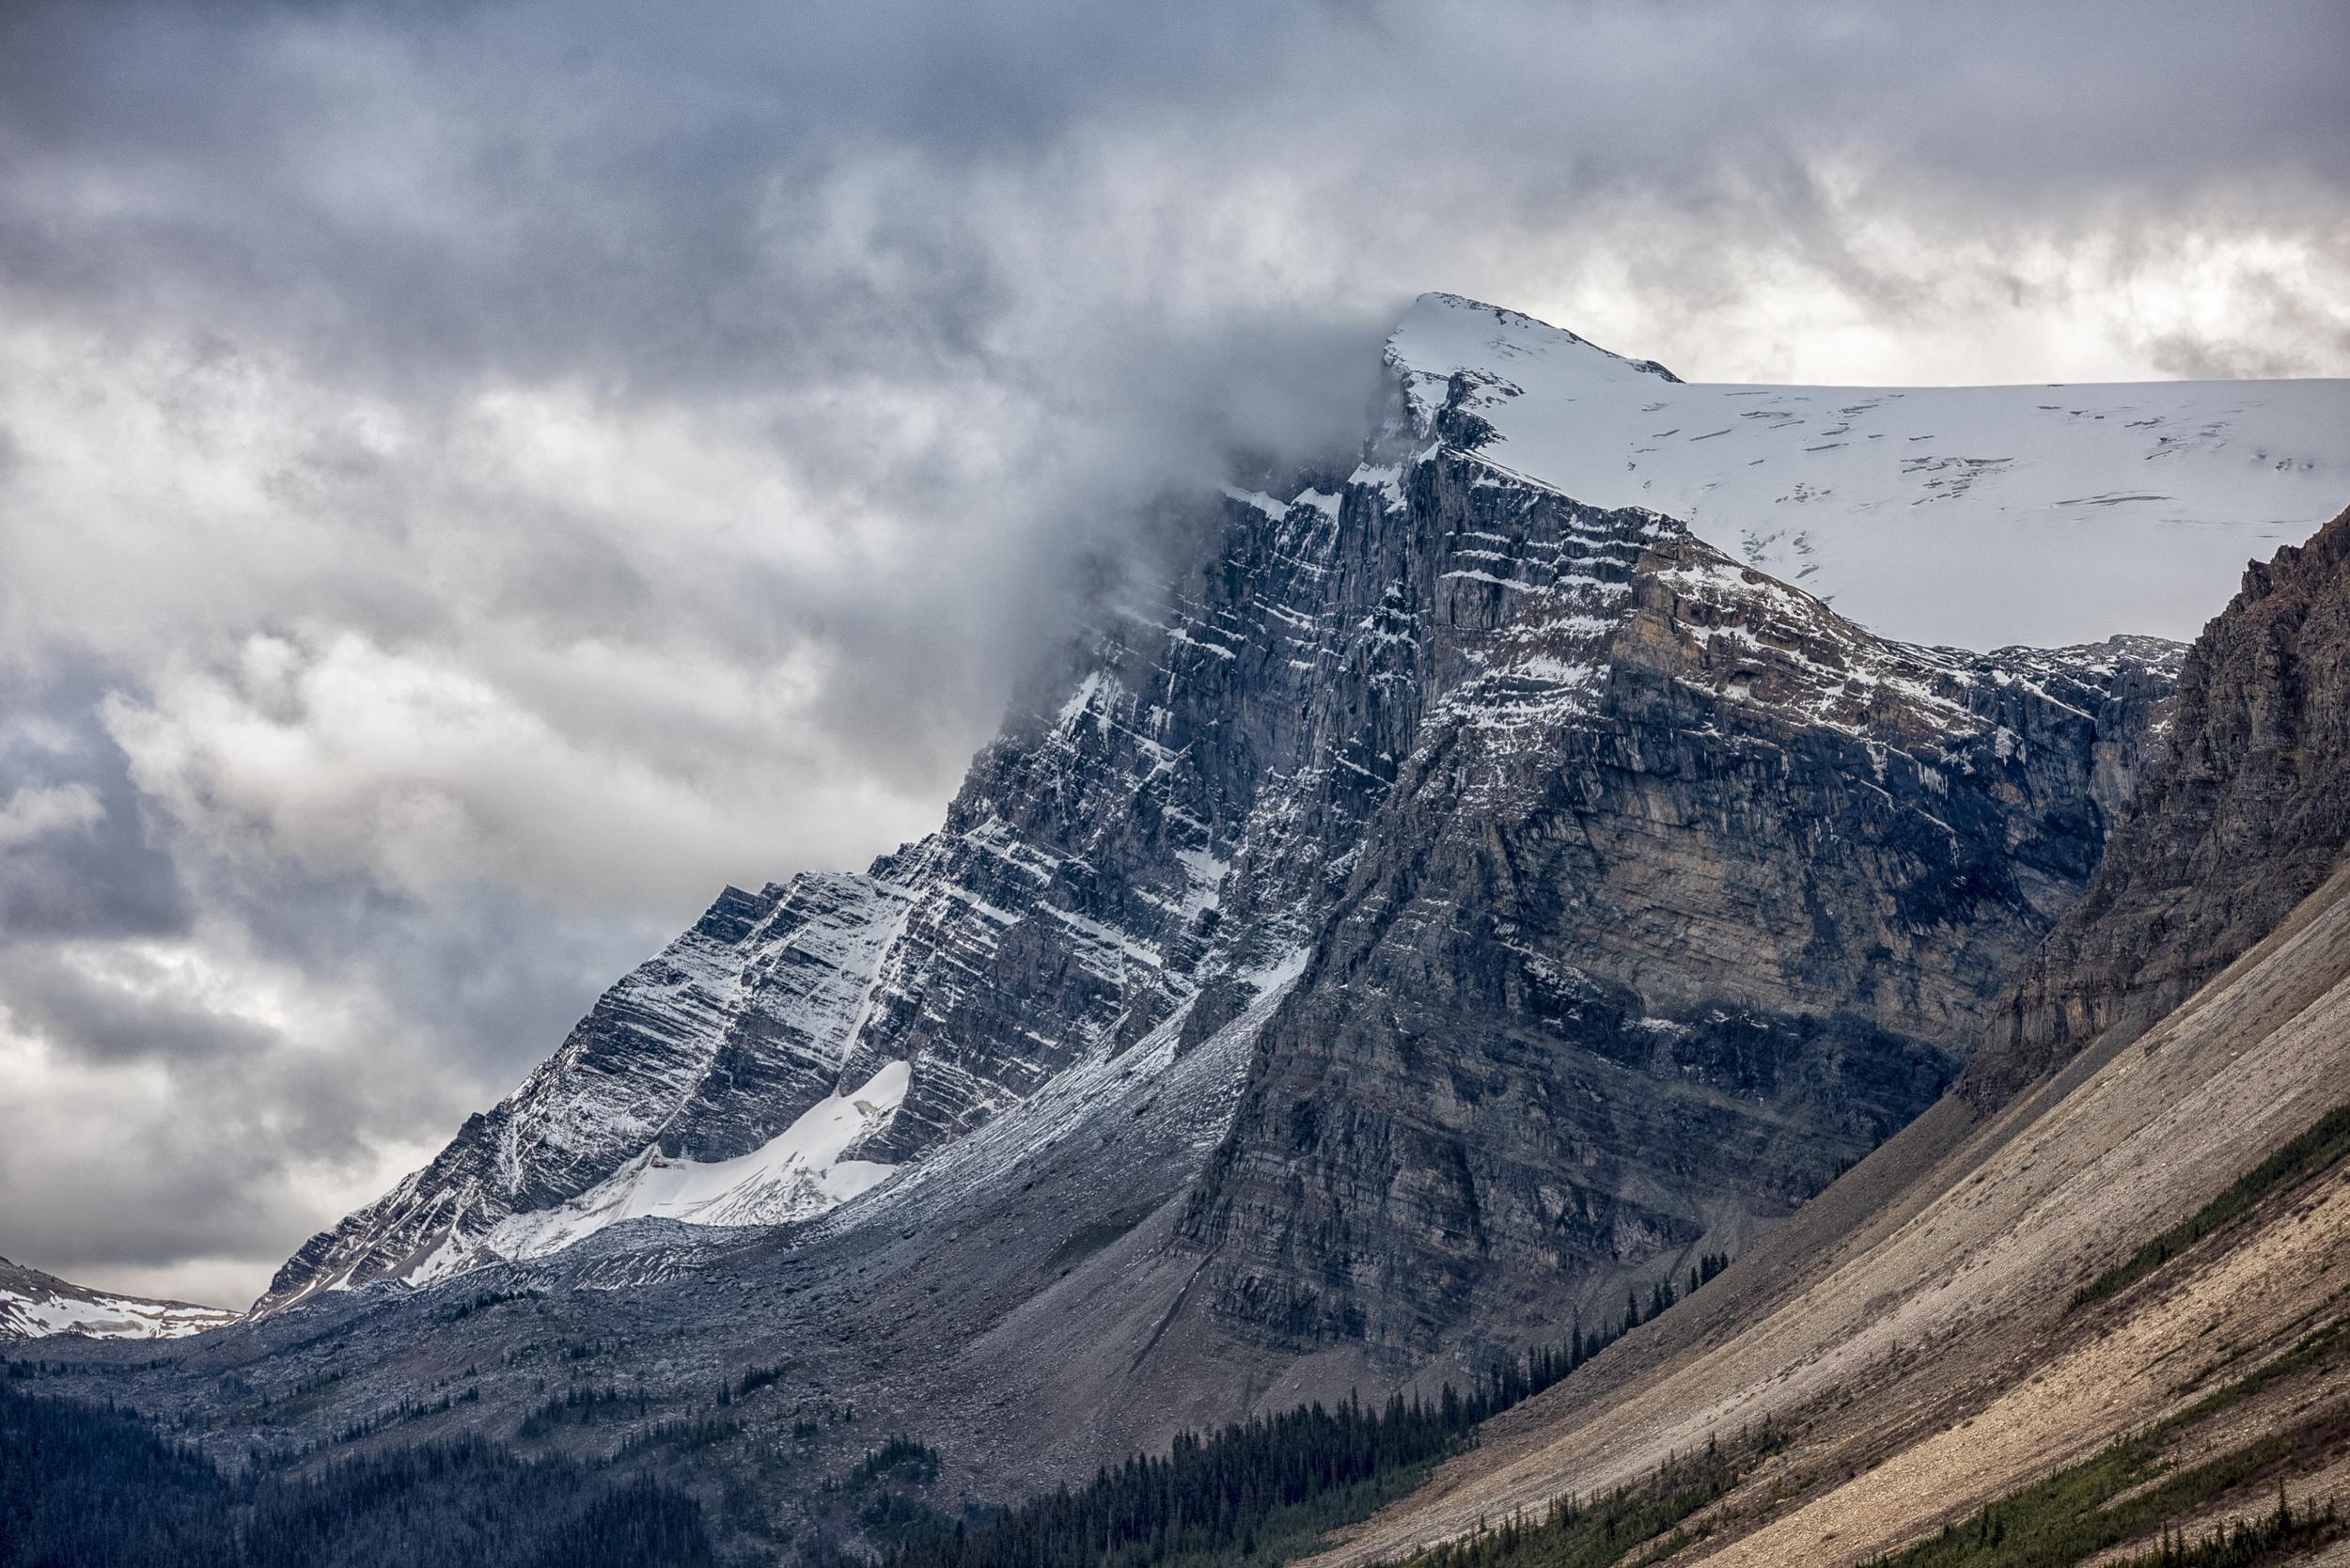 Dramatic Clouds hit the Rockies, Alberta